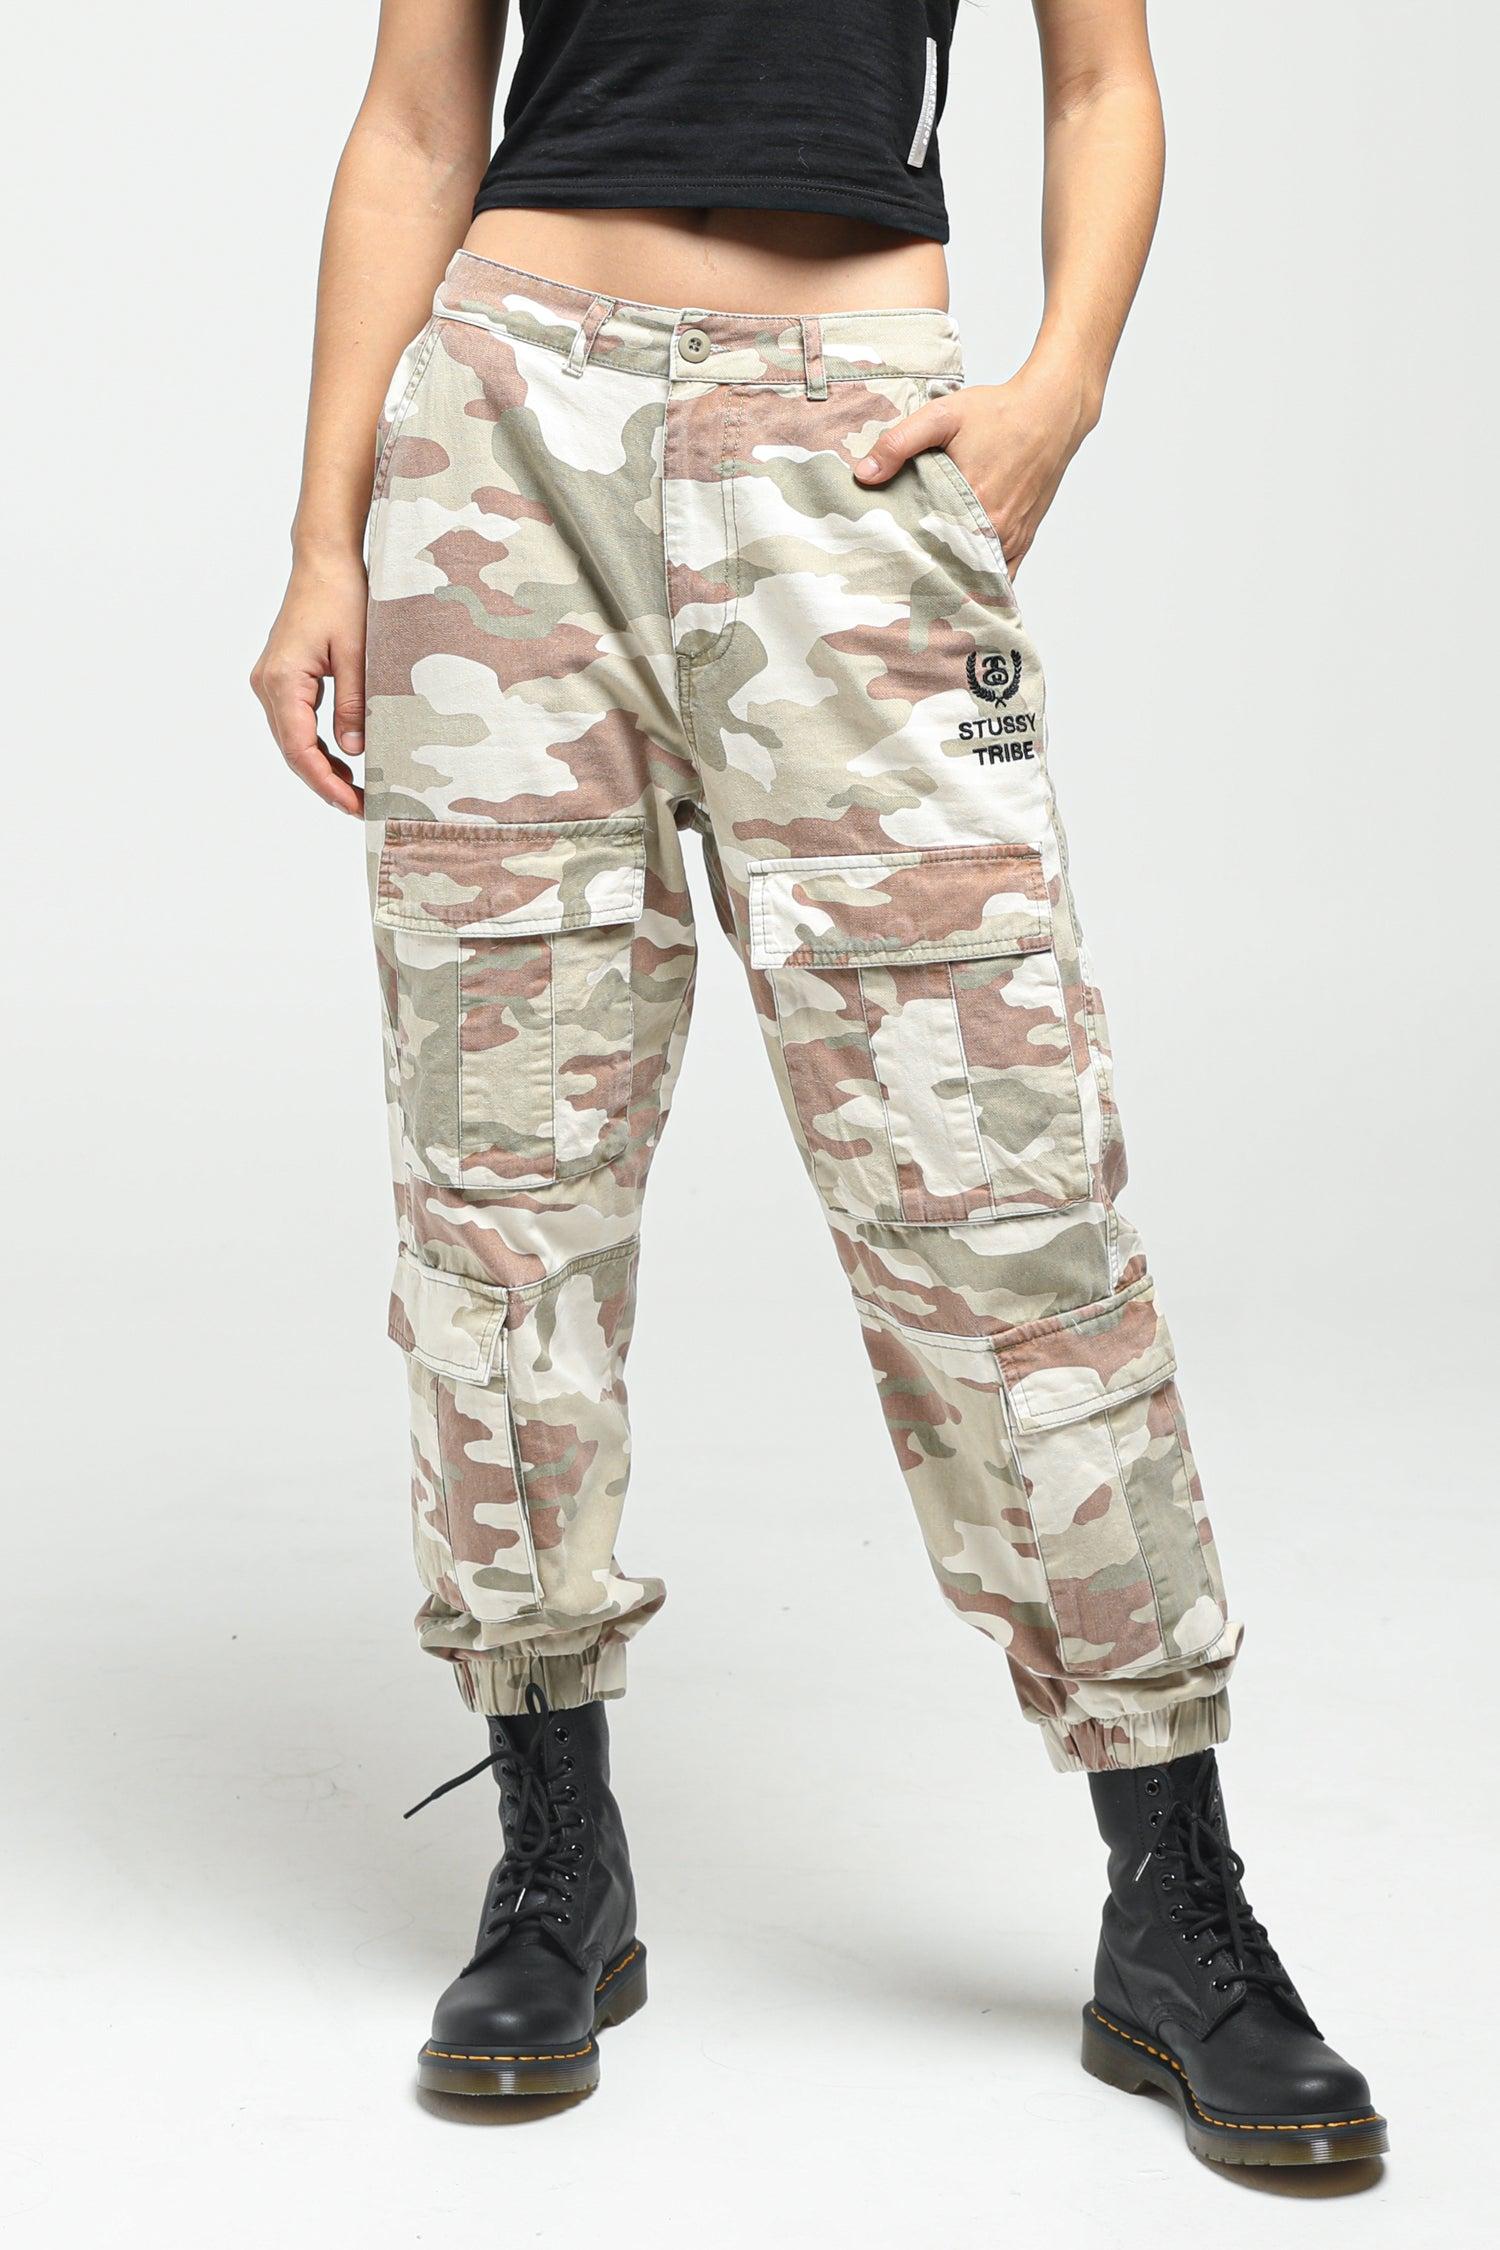 Stussy Women's Hunt Cargo Pant Black